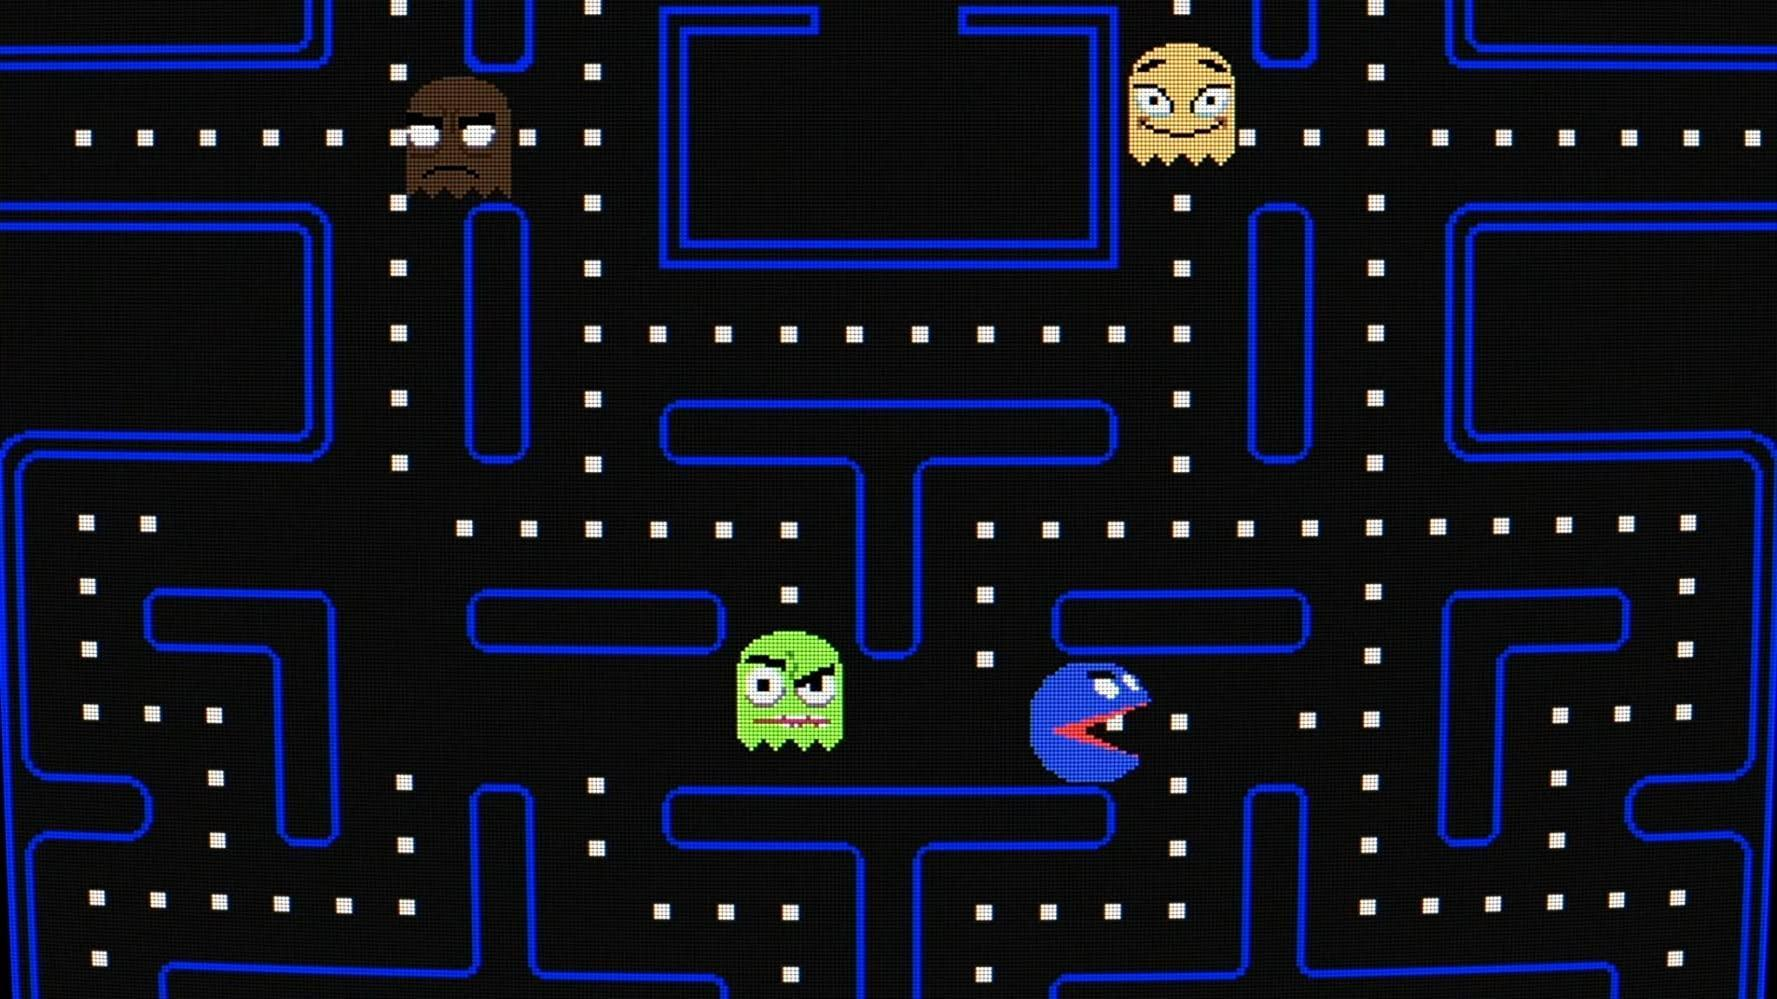 Gorillaz x pacman | fanart. Image Gallery For Gorillaz Feat Schoolboy Q Pac Man Music Video 2020 Filmaffinity